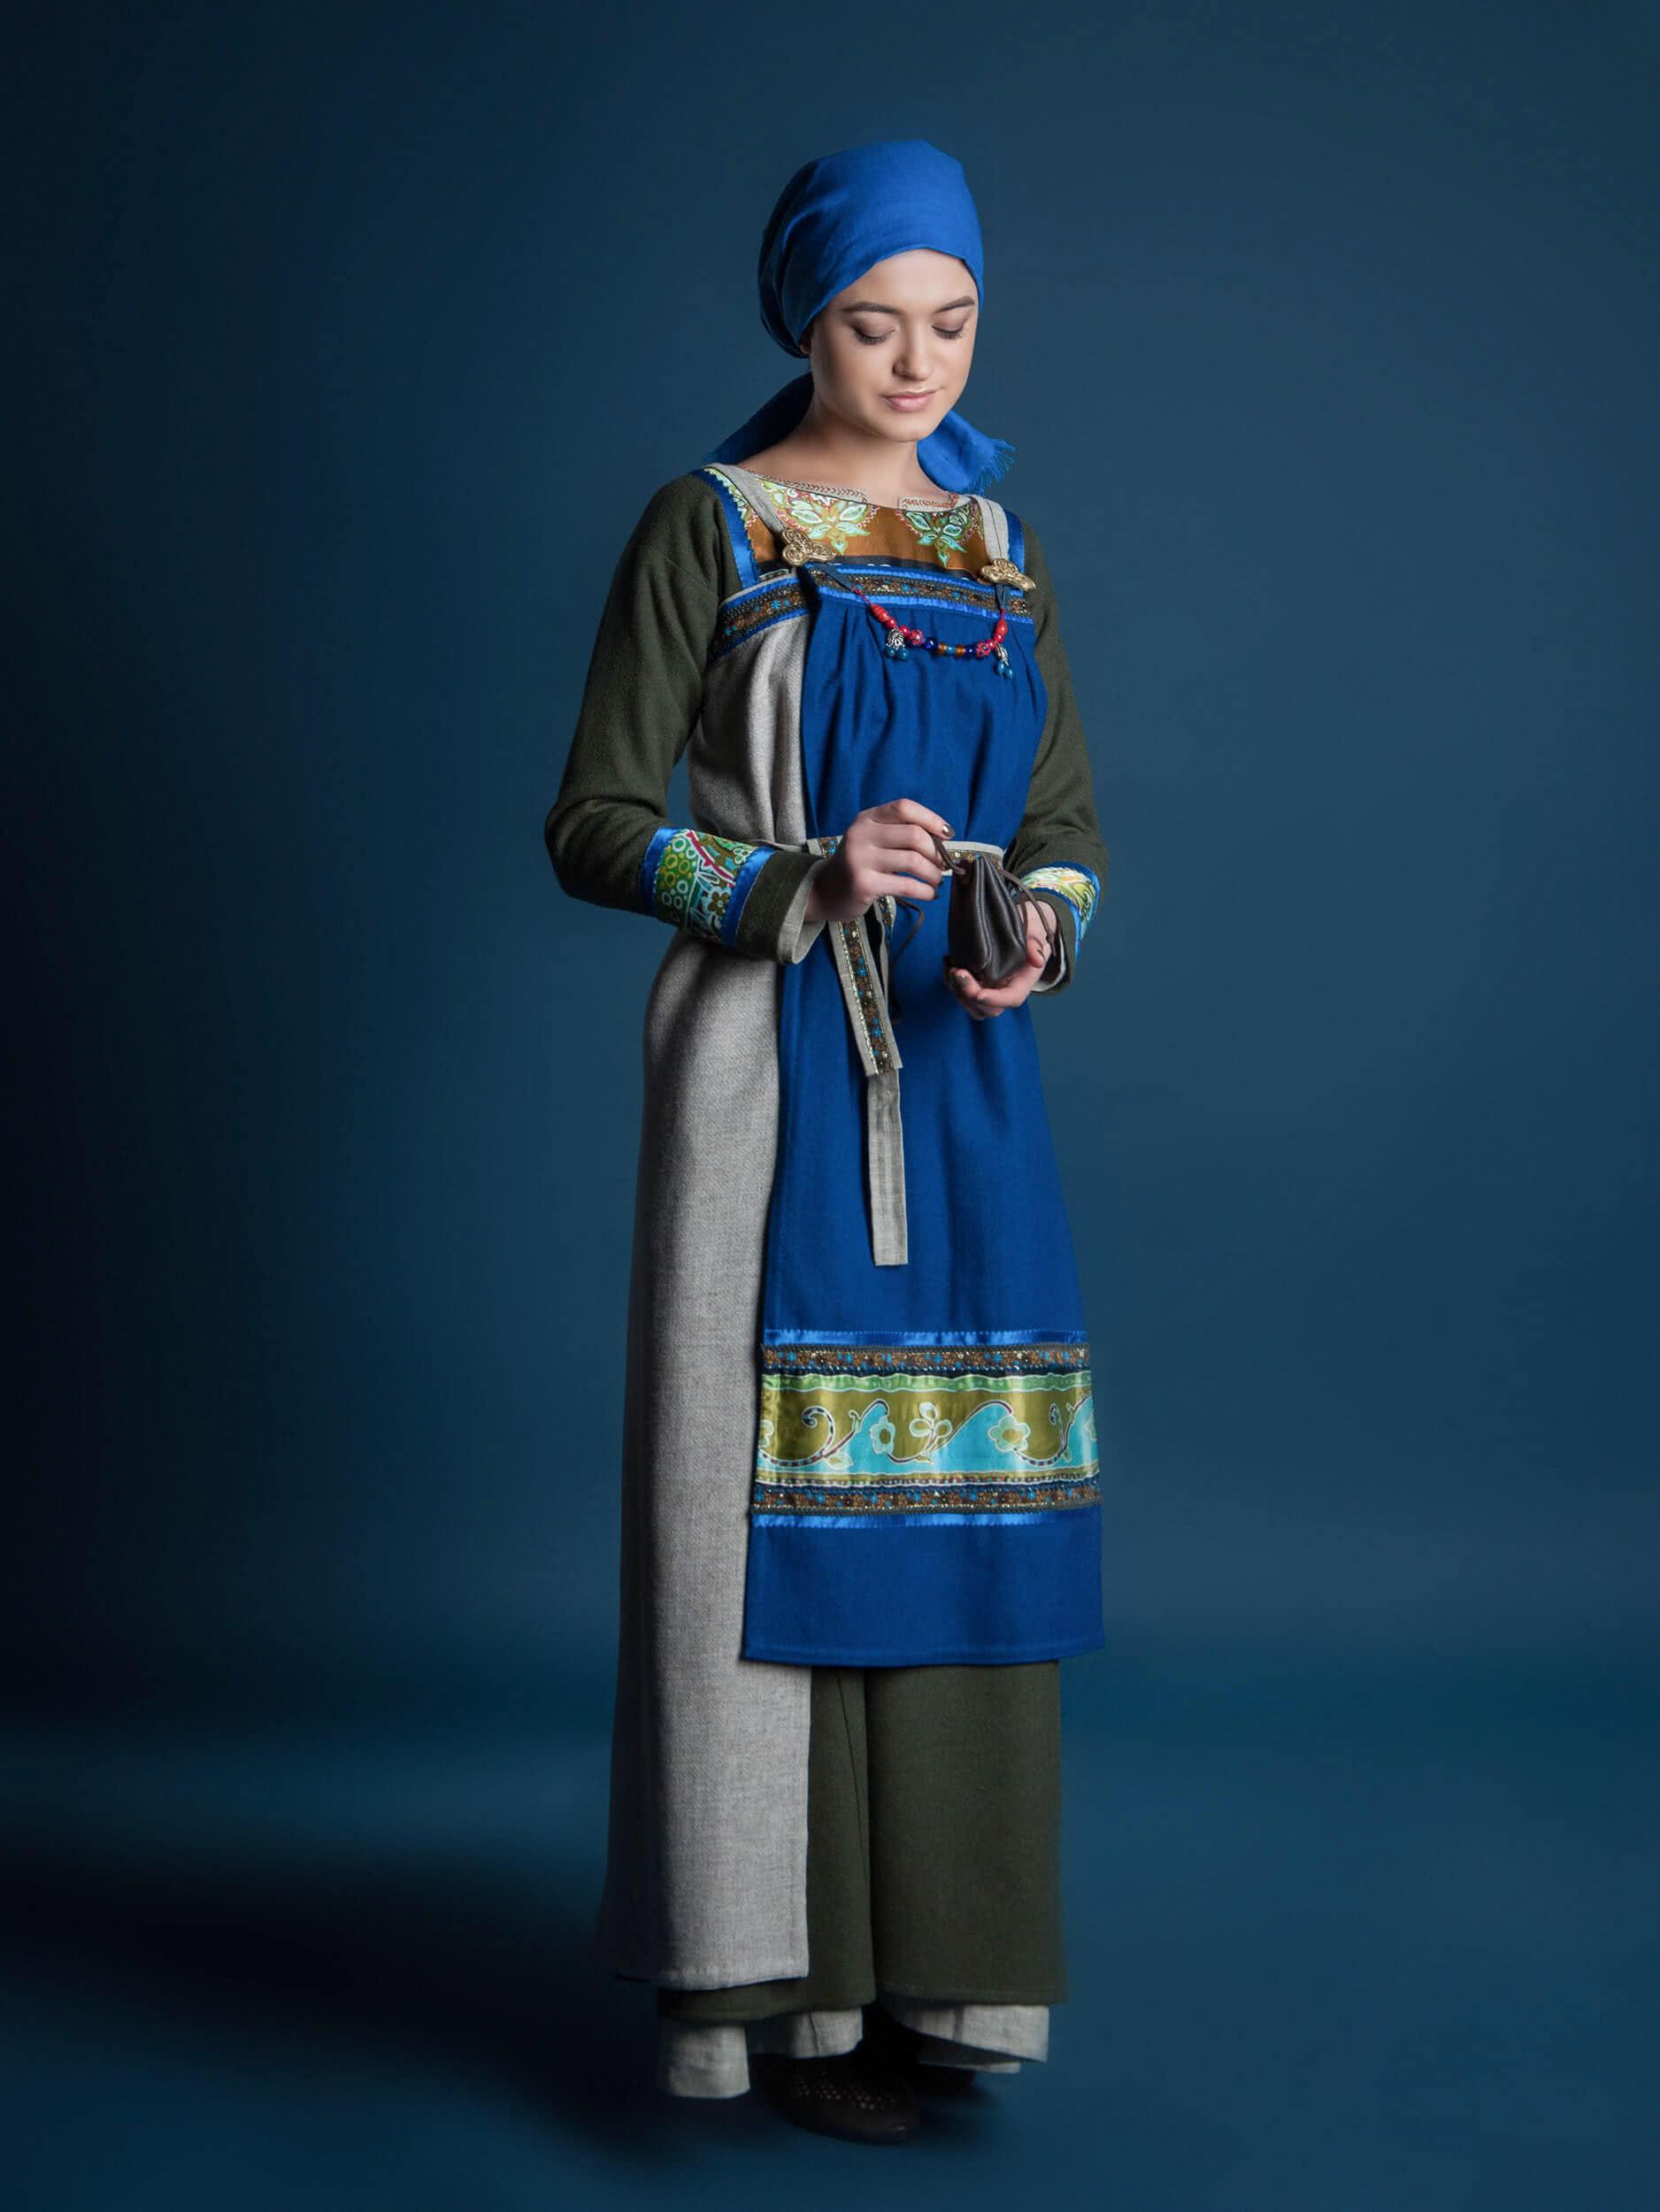 viking blue dress viking clothing viking outfit